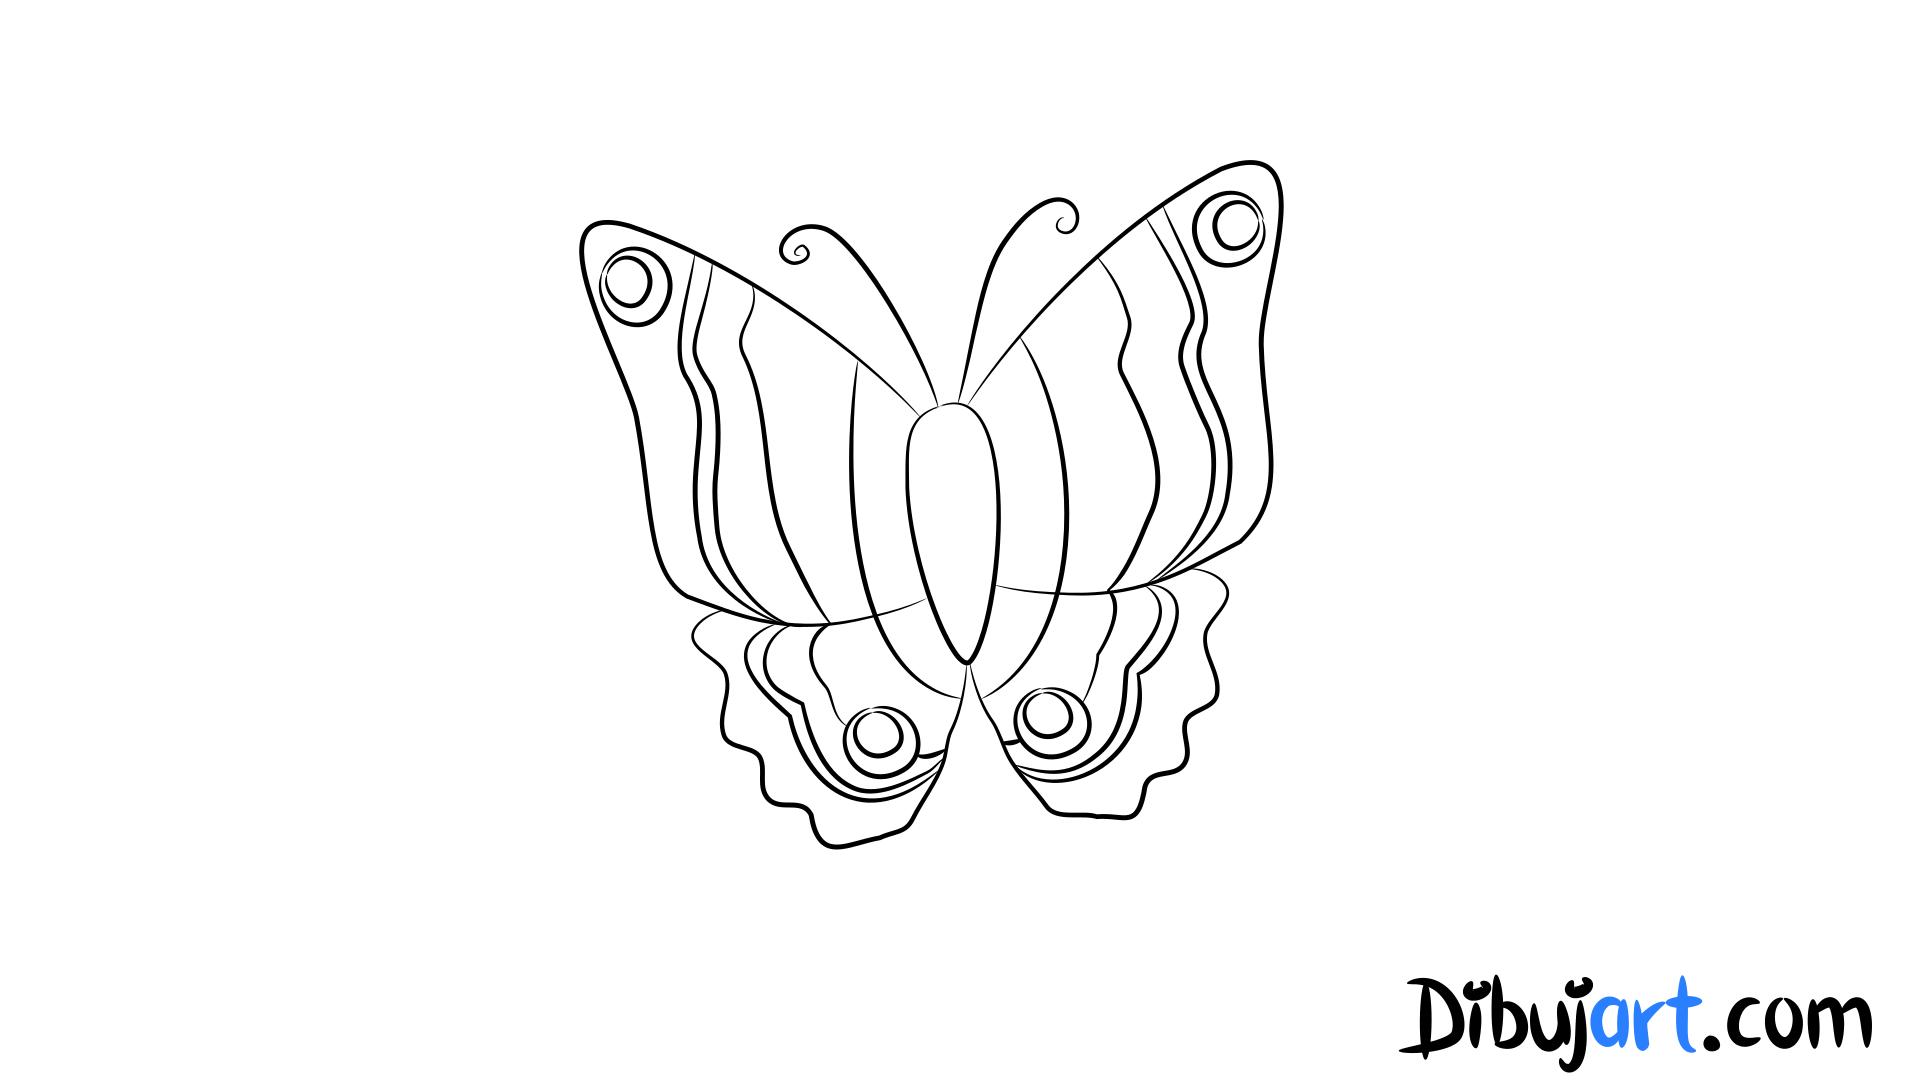 cómo dibujar una mariposa paso a paso  dibujart